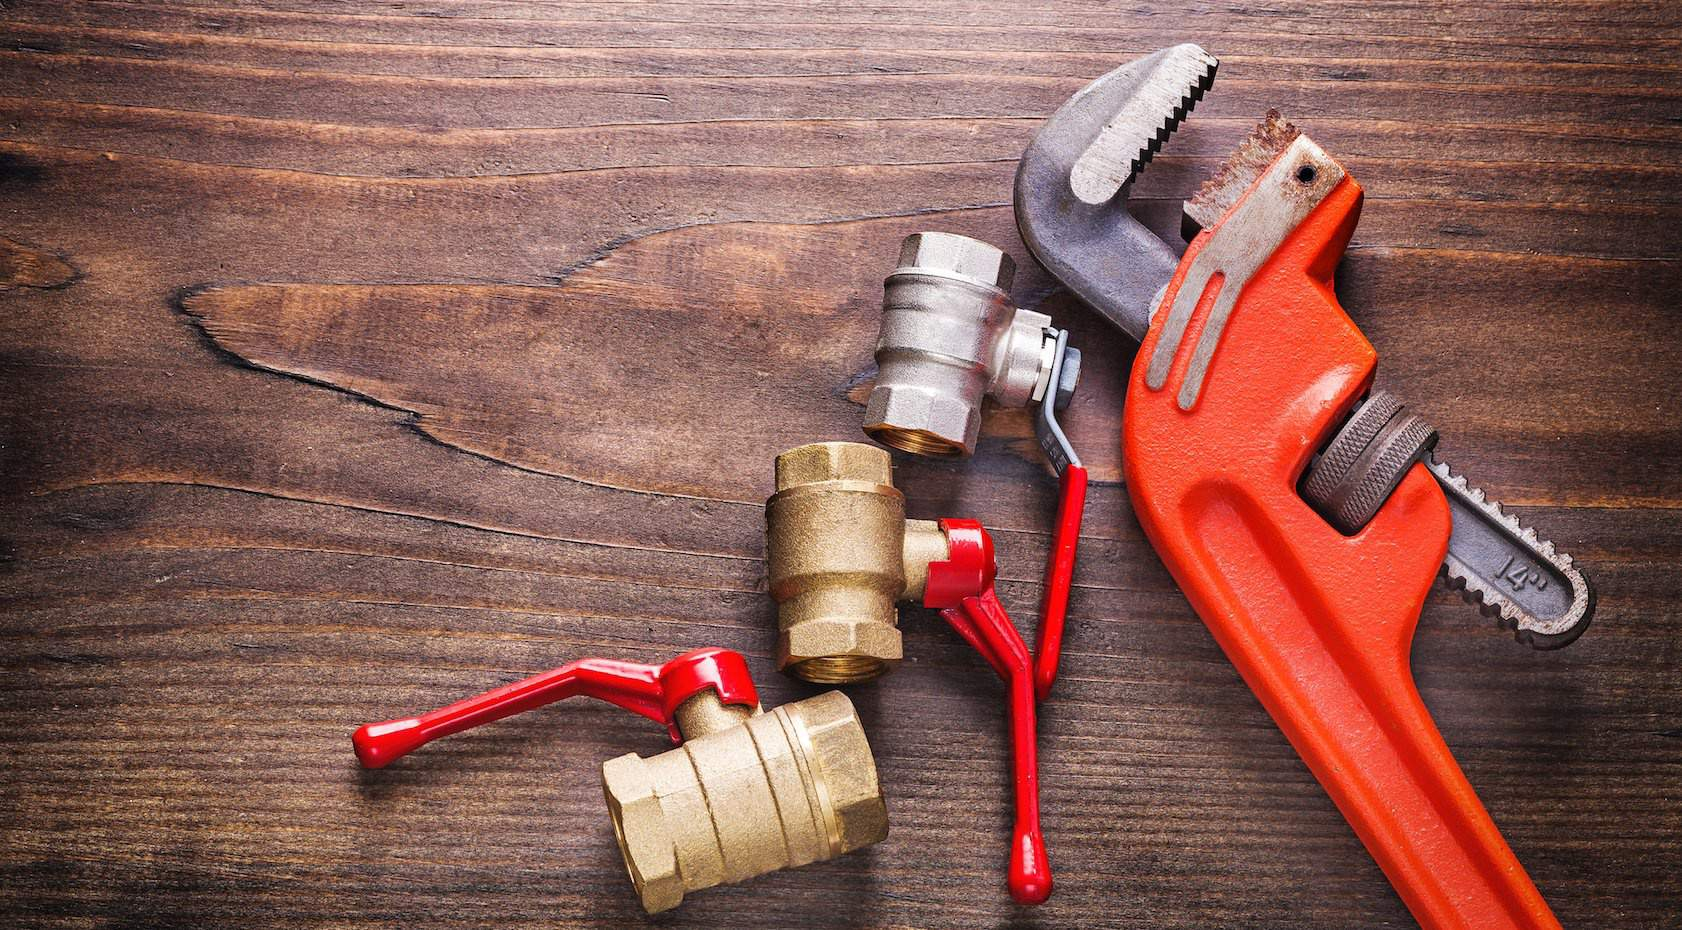 Concrete Sealants | Tools - DiyToolKit